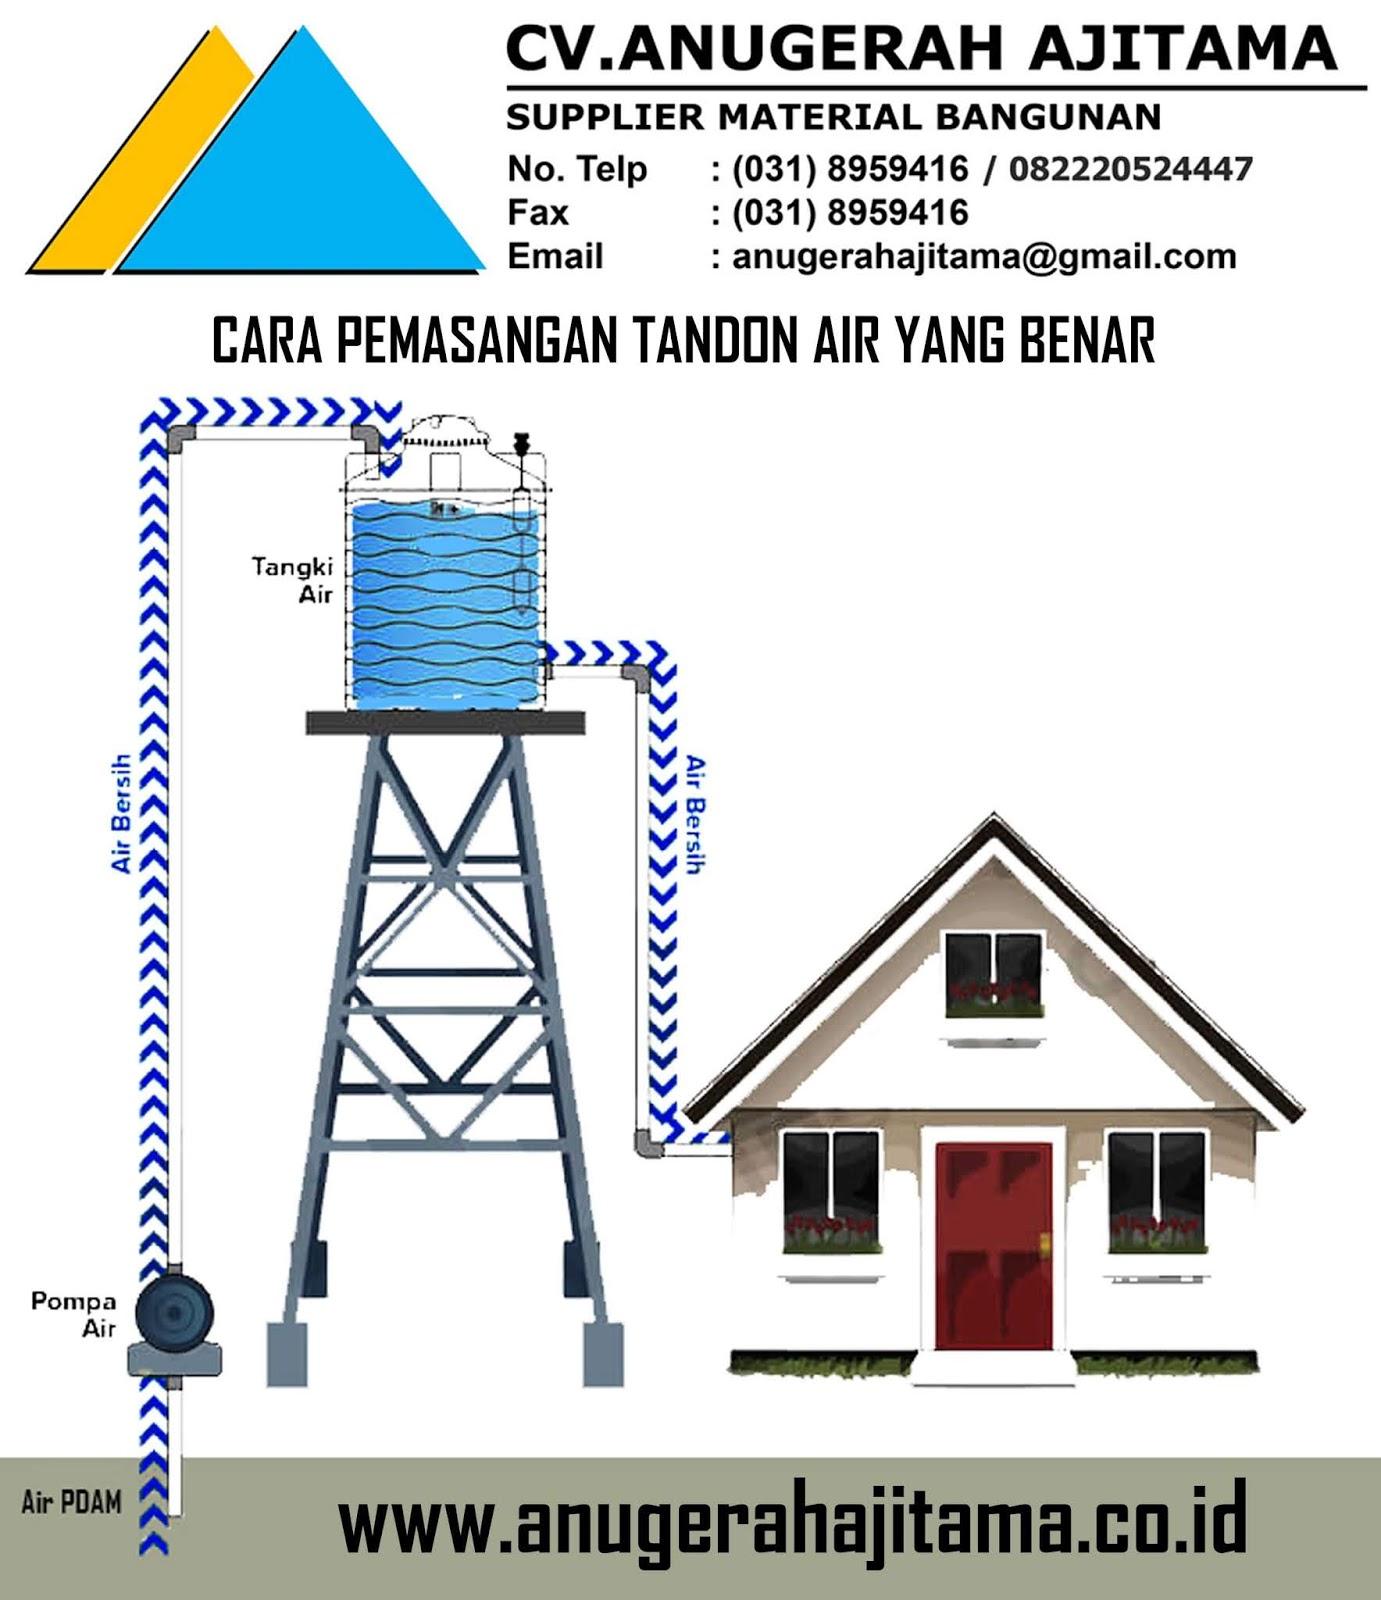 Cara Pemasangan Tandon Air Yang Benar Cv Anugerah Ajitama